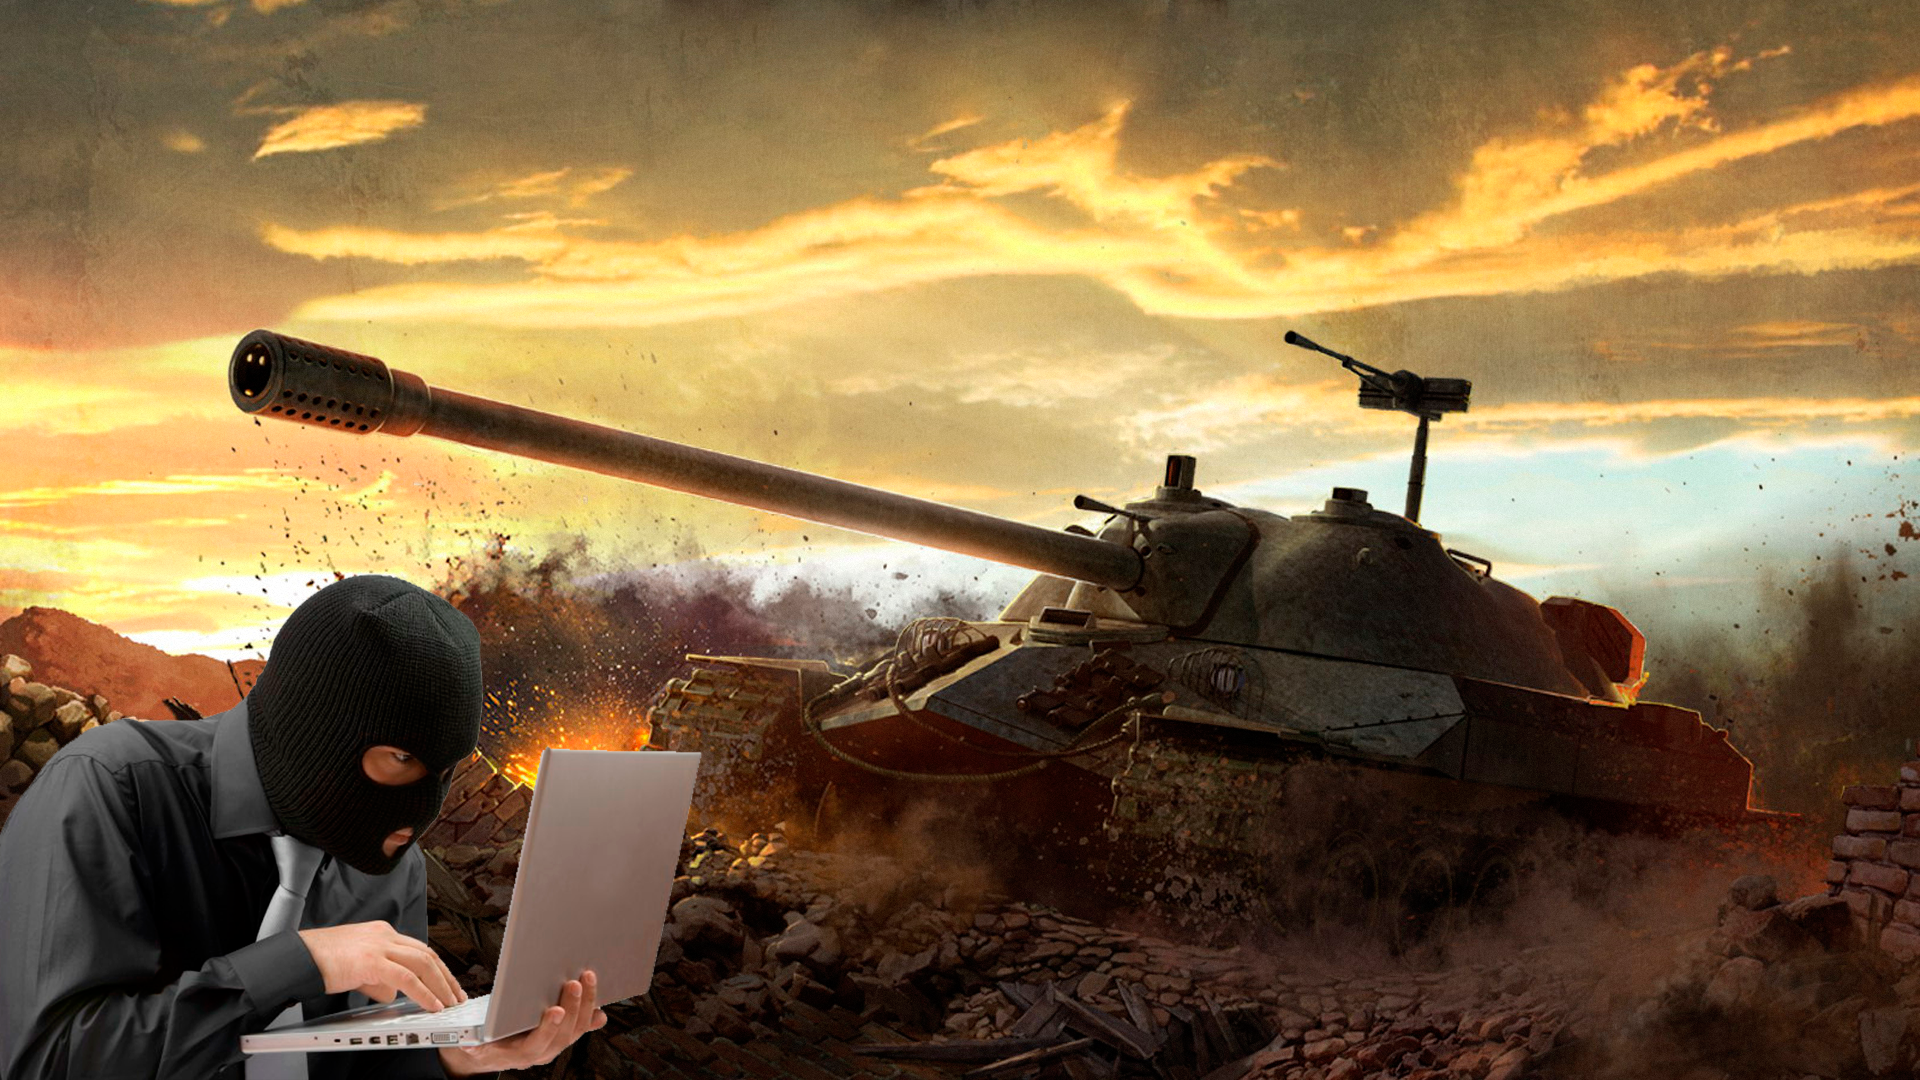 В Беларуси возбудили уголовное дело за угон виртуального танка